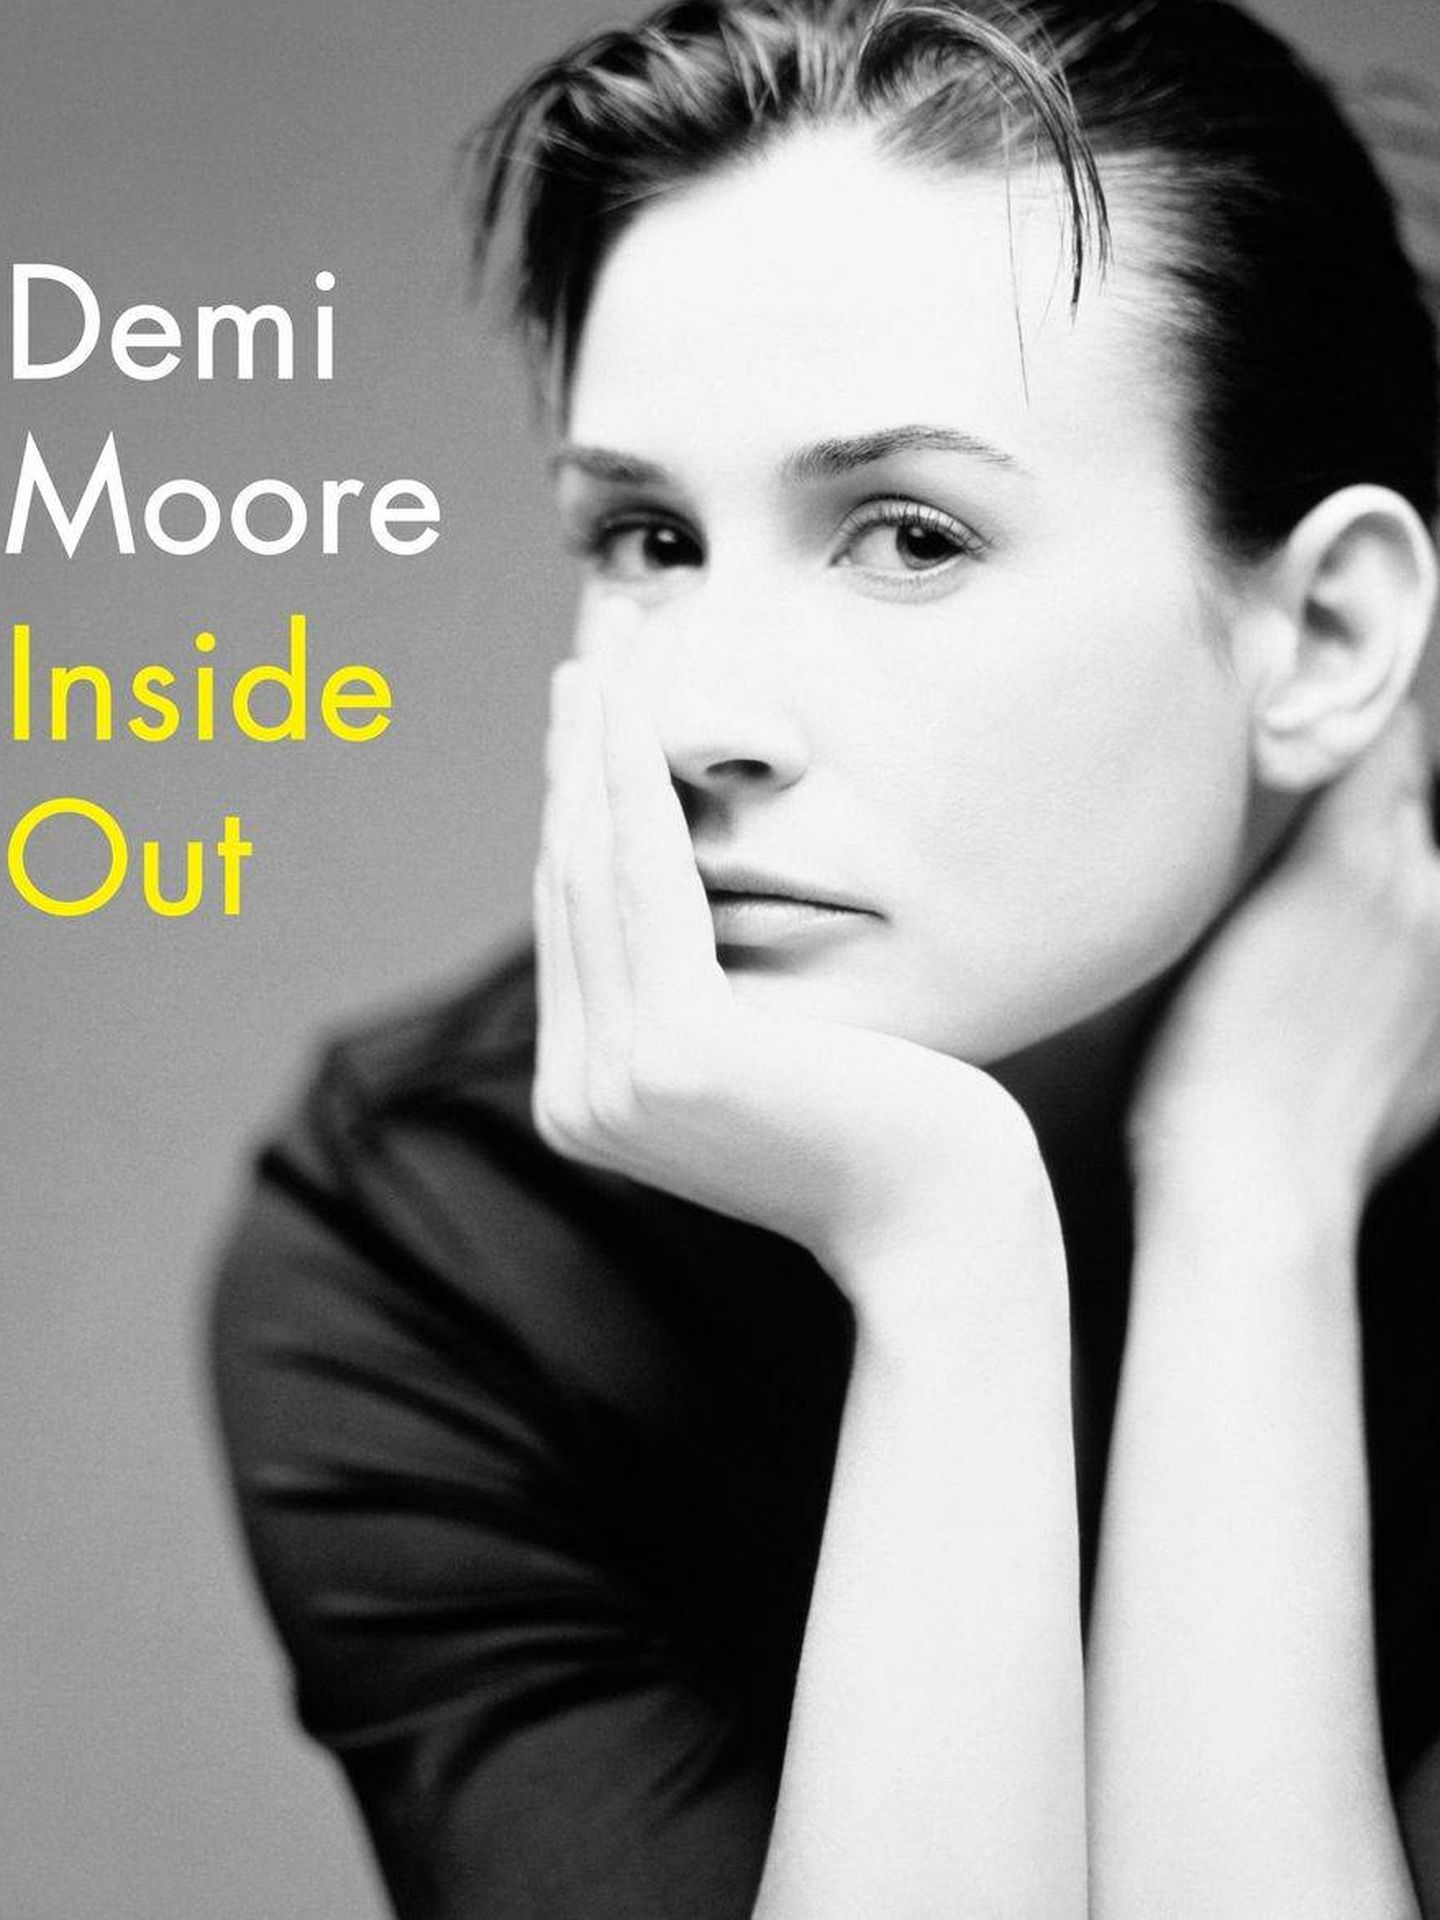 La portada del libro de Demi Moore.